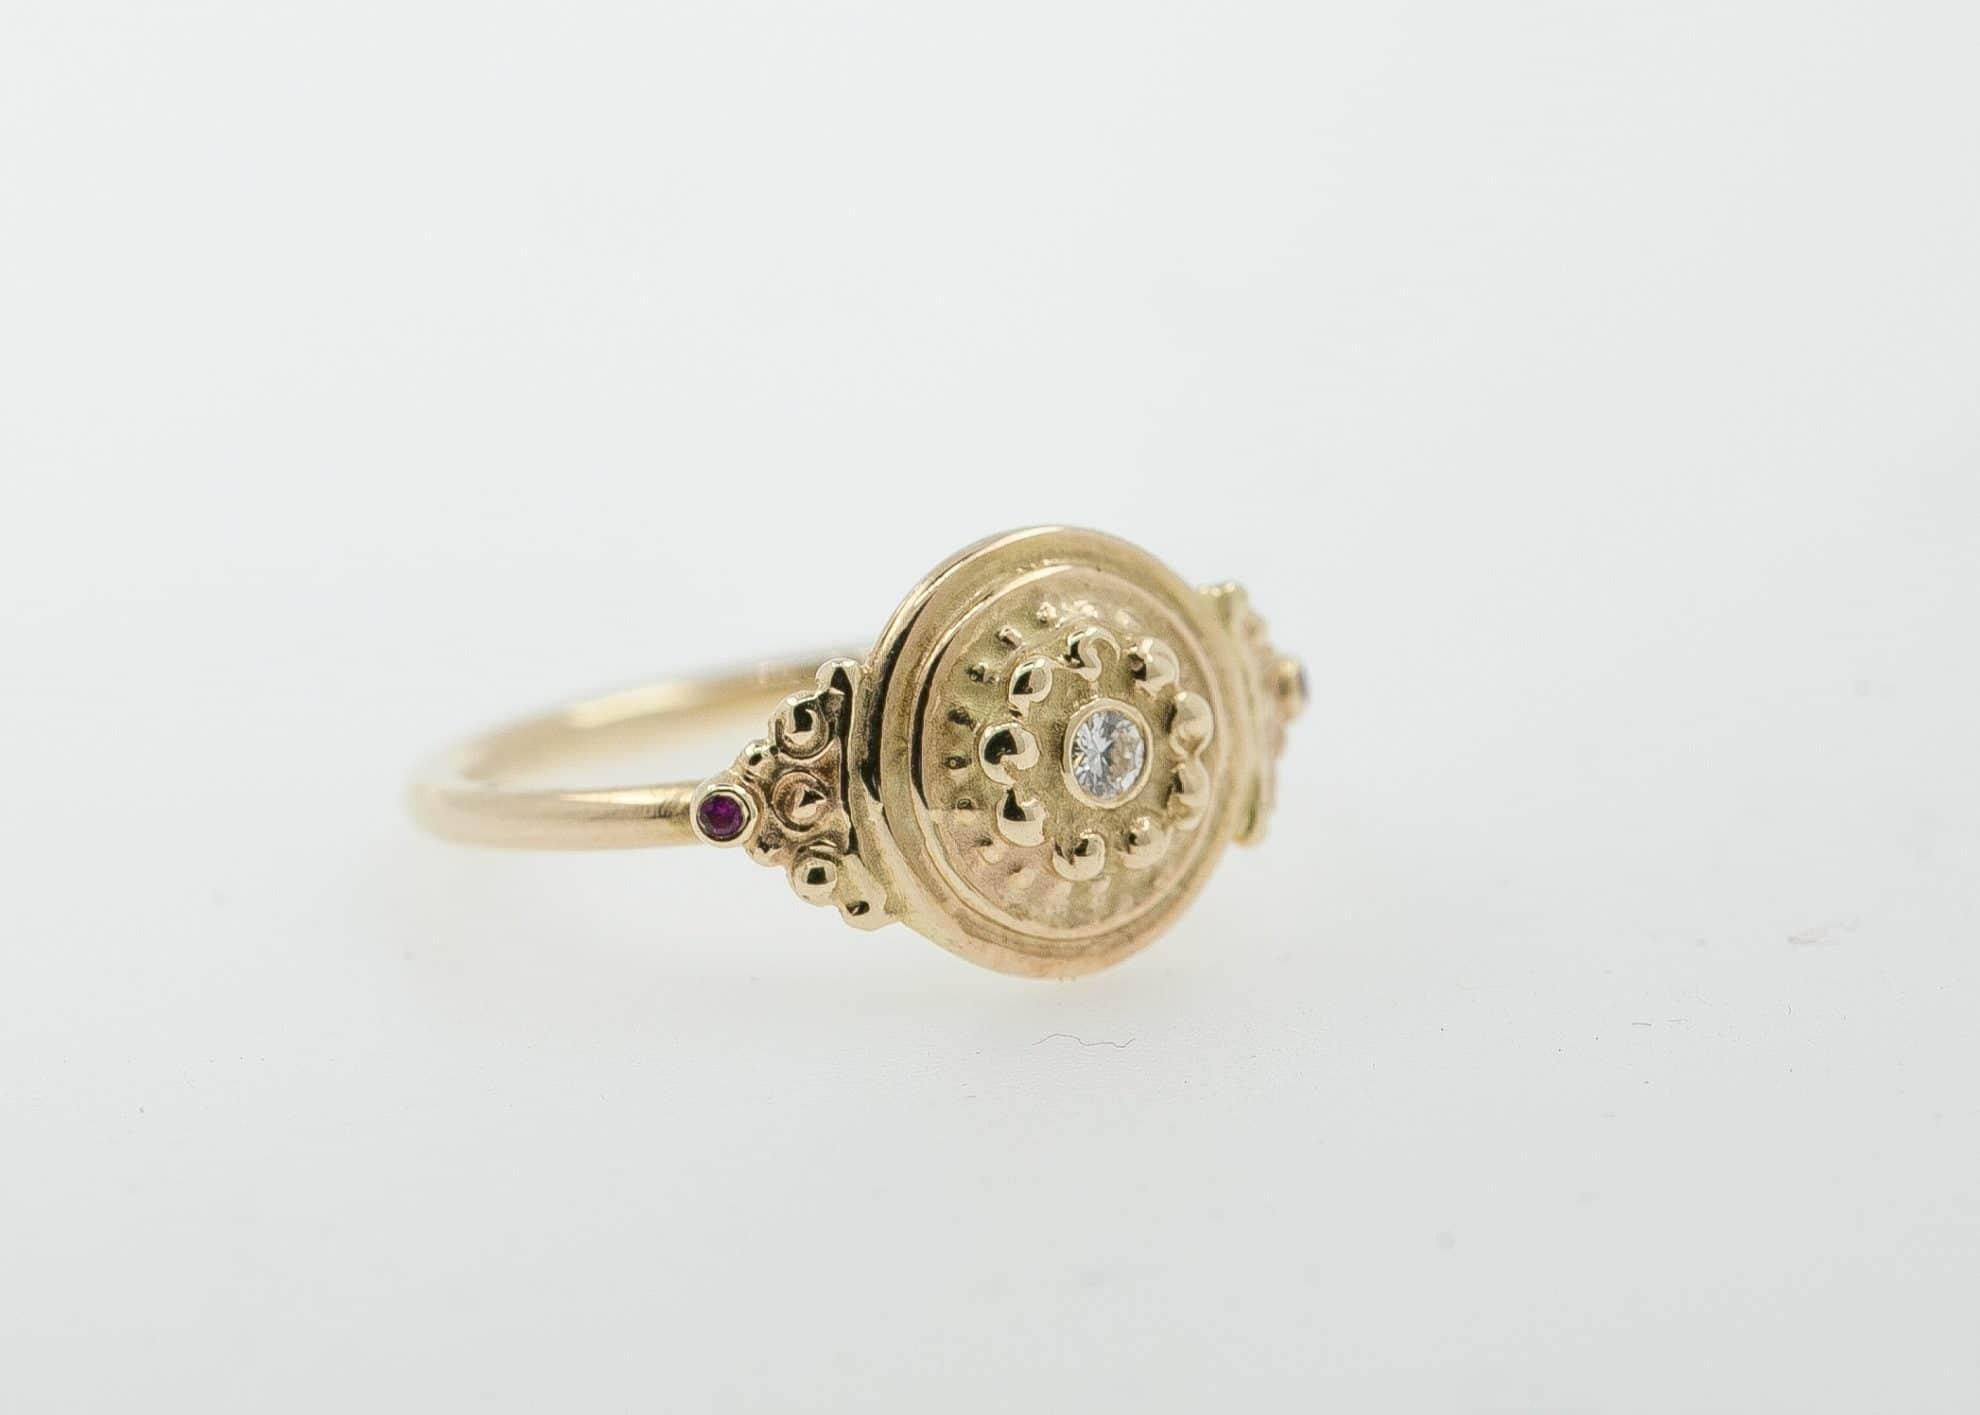 14k gold, 2mm white diamond, 1mm Ruby